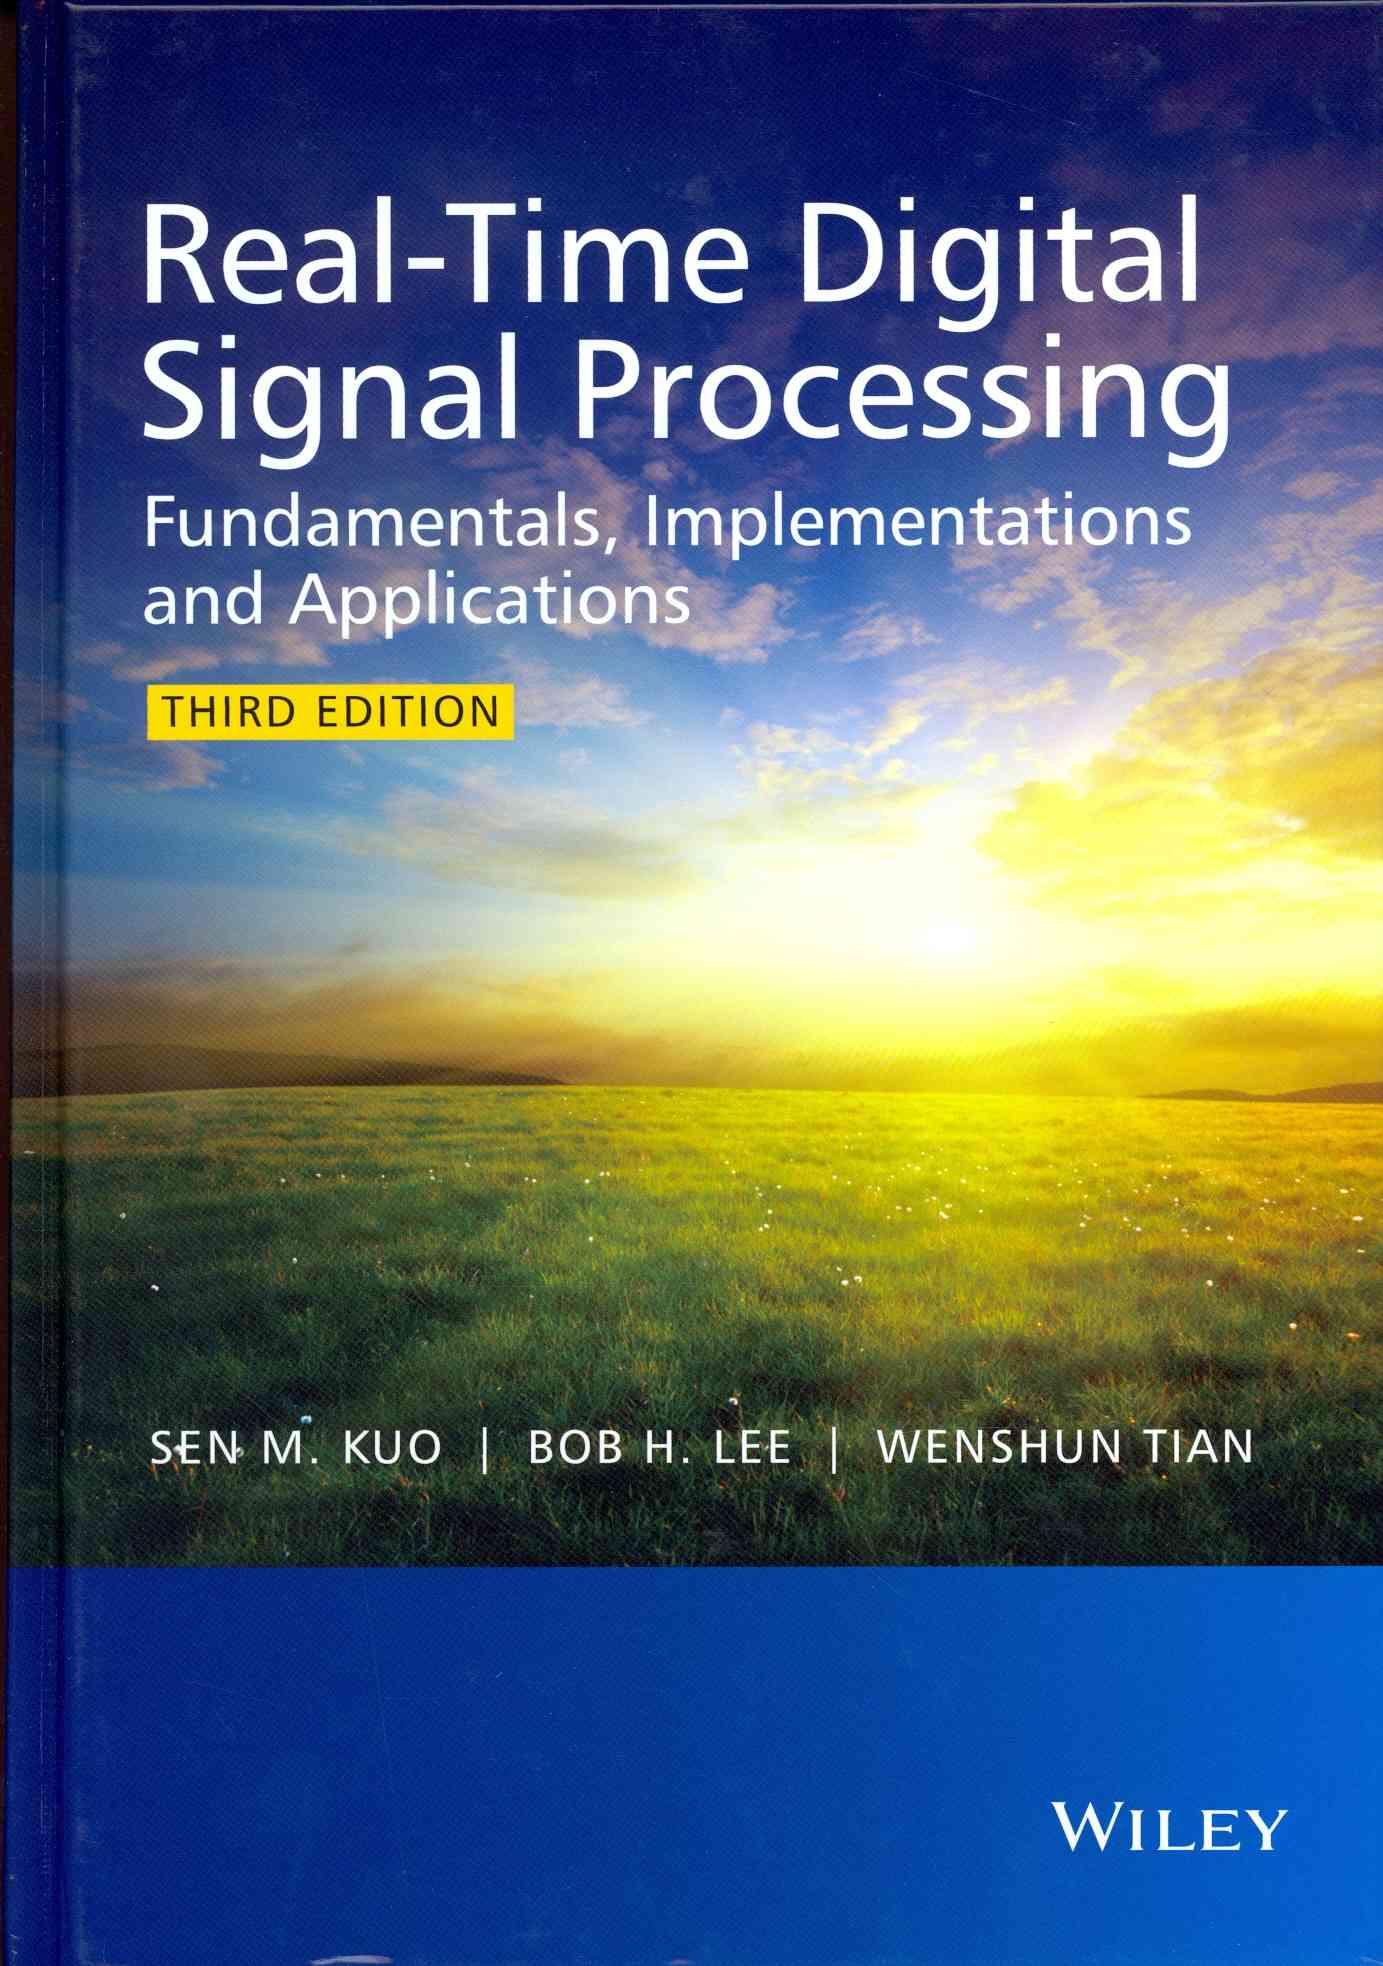 Real-Time Digital Signal Processing By Kuo, Sen M./ Lee, Bob H./ Tian, Wenshun